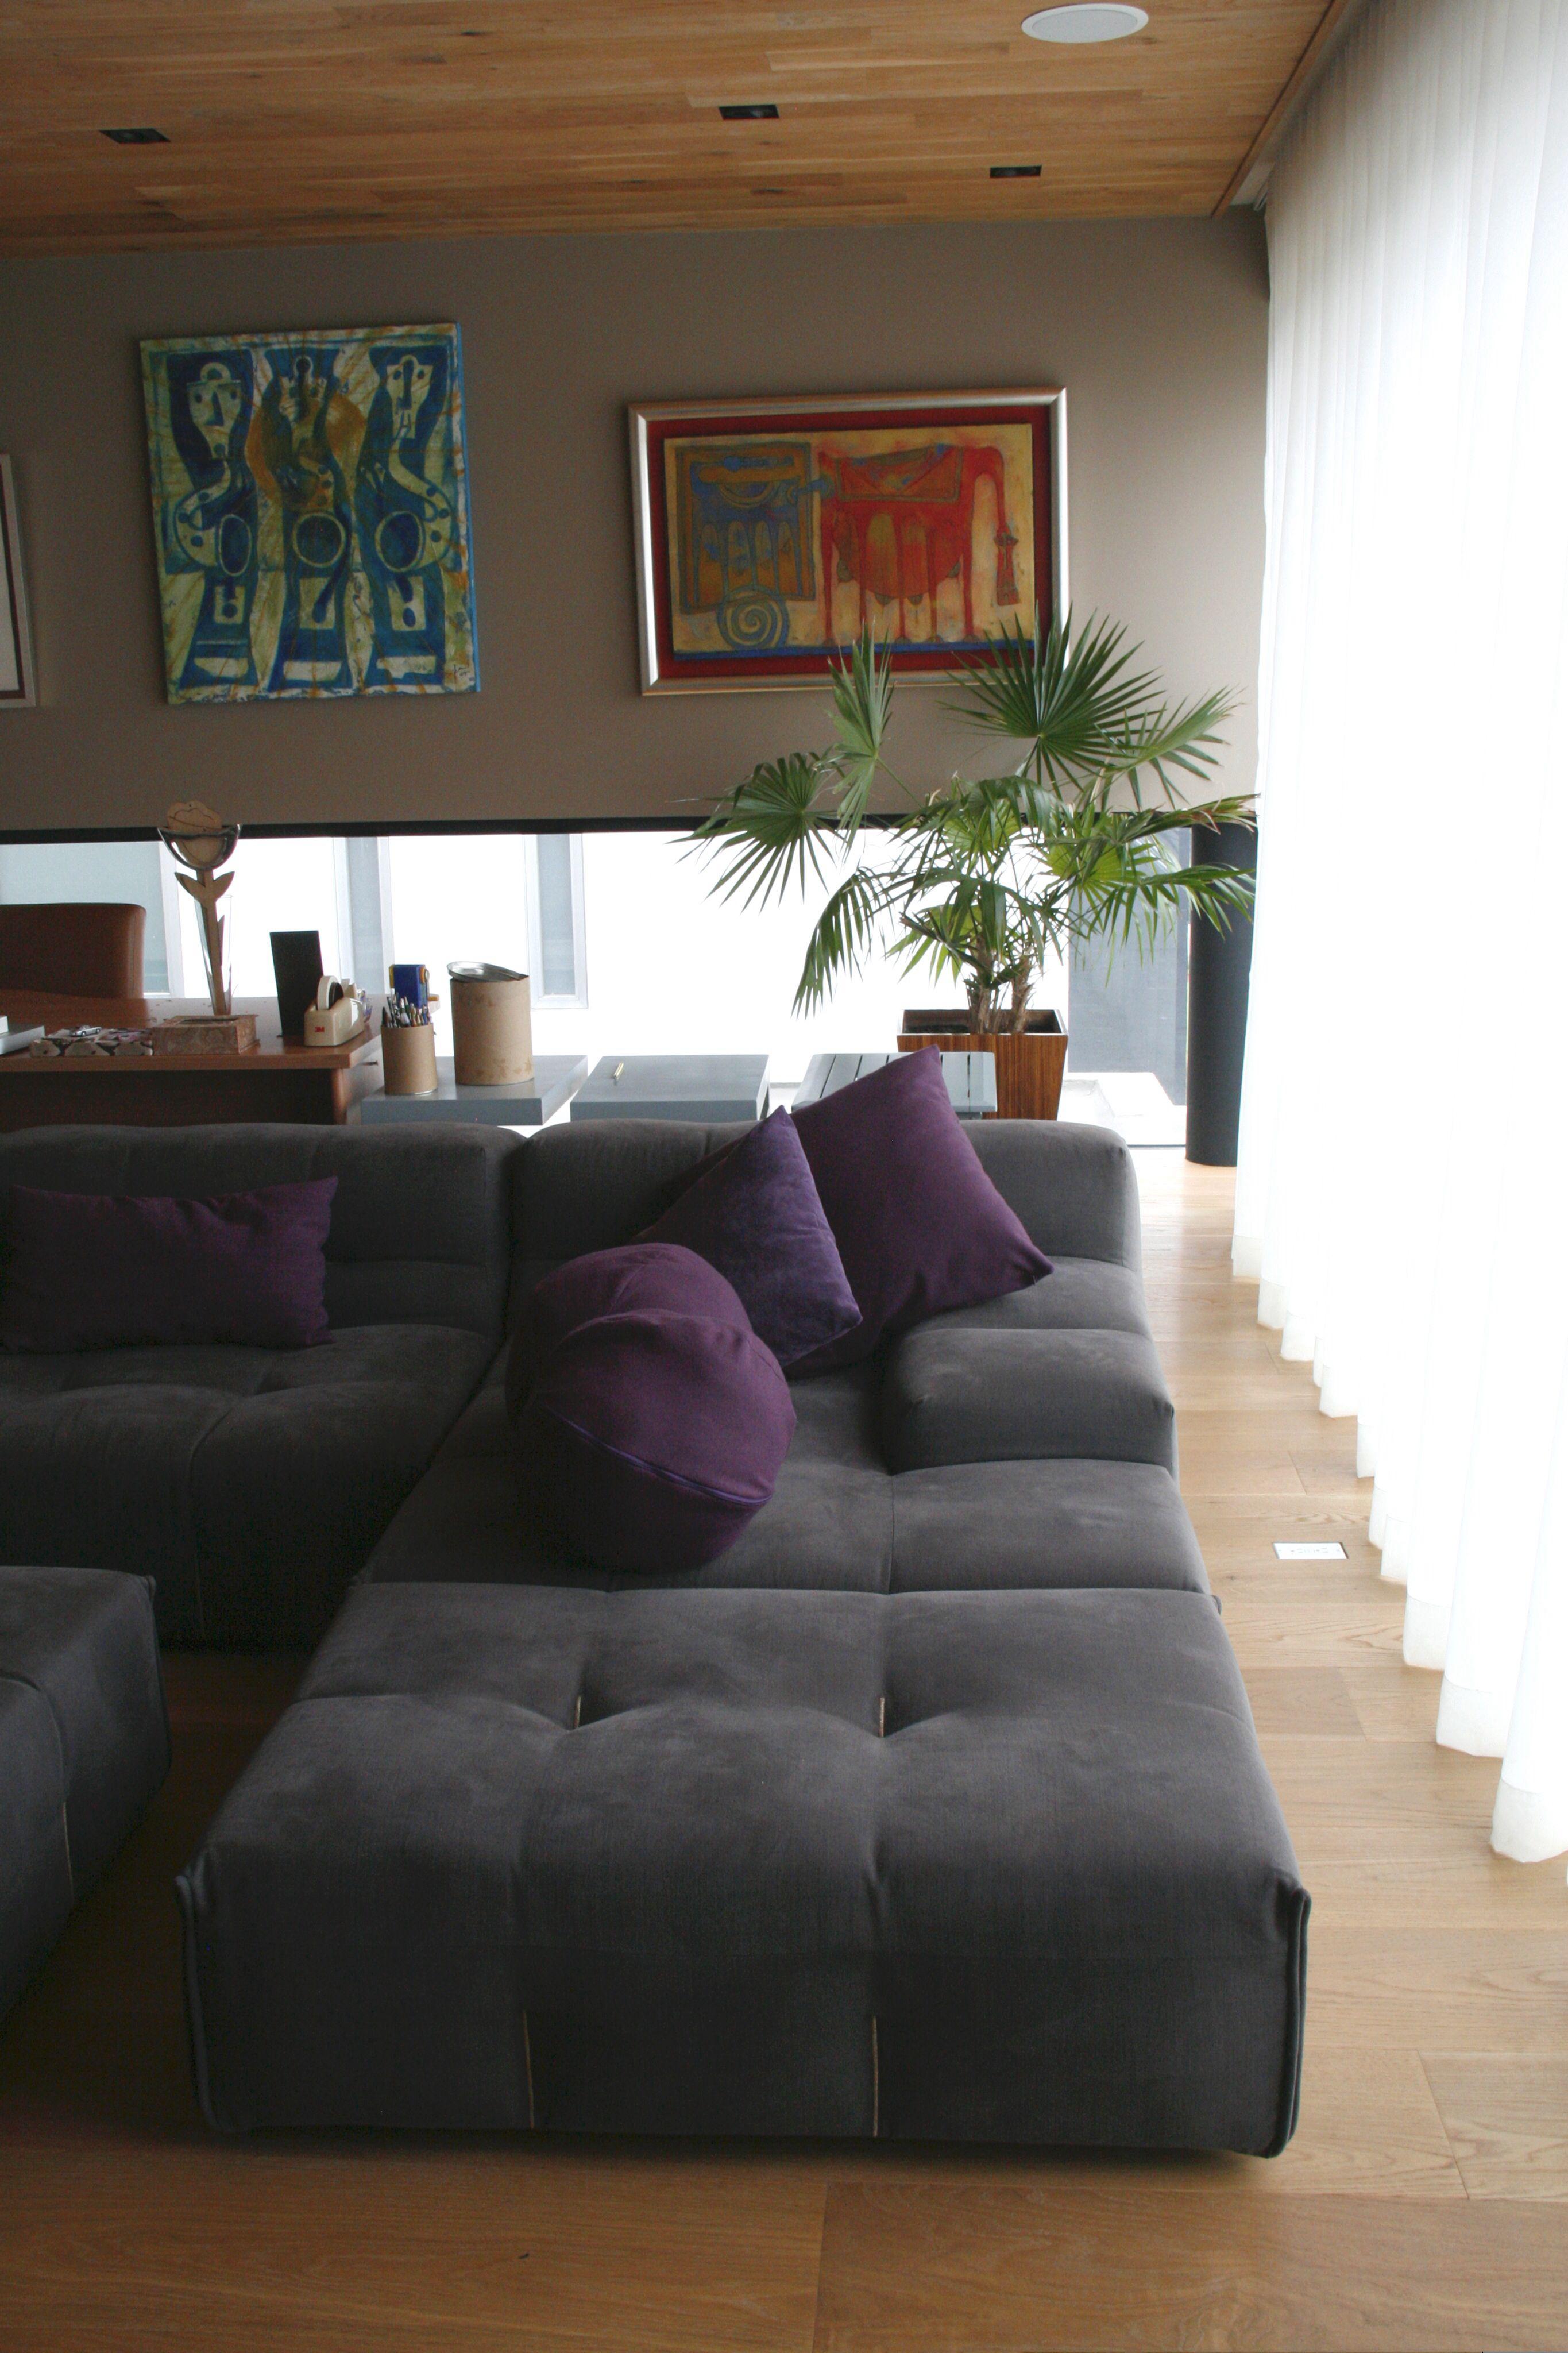 Casa ss family sillones de tela arte plaf n de madera c digo z arquitectos casa ss - Sillones de tela ...